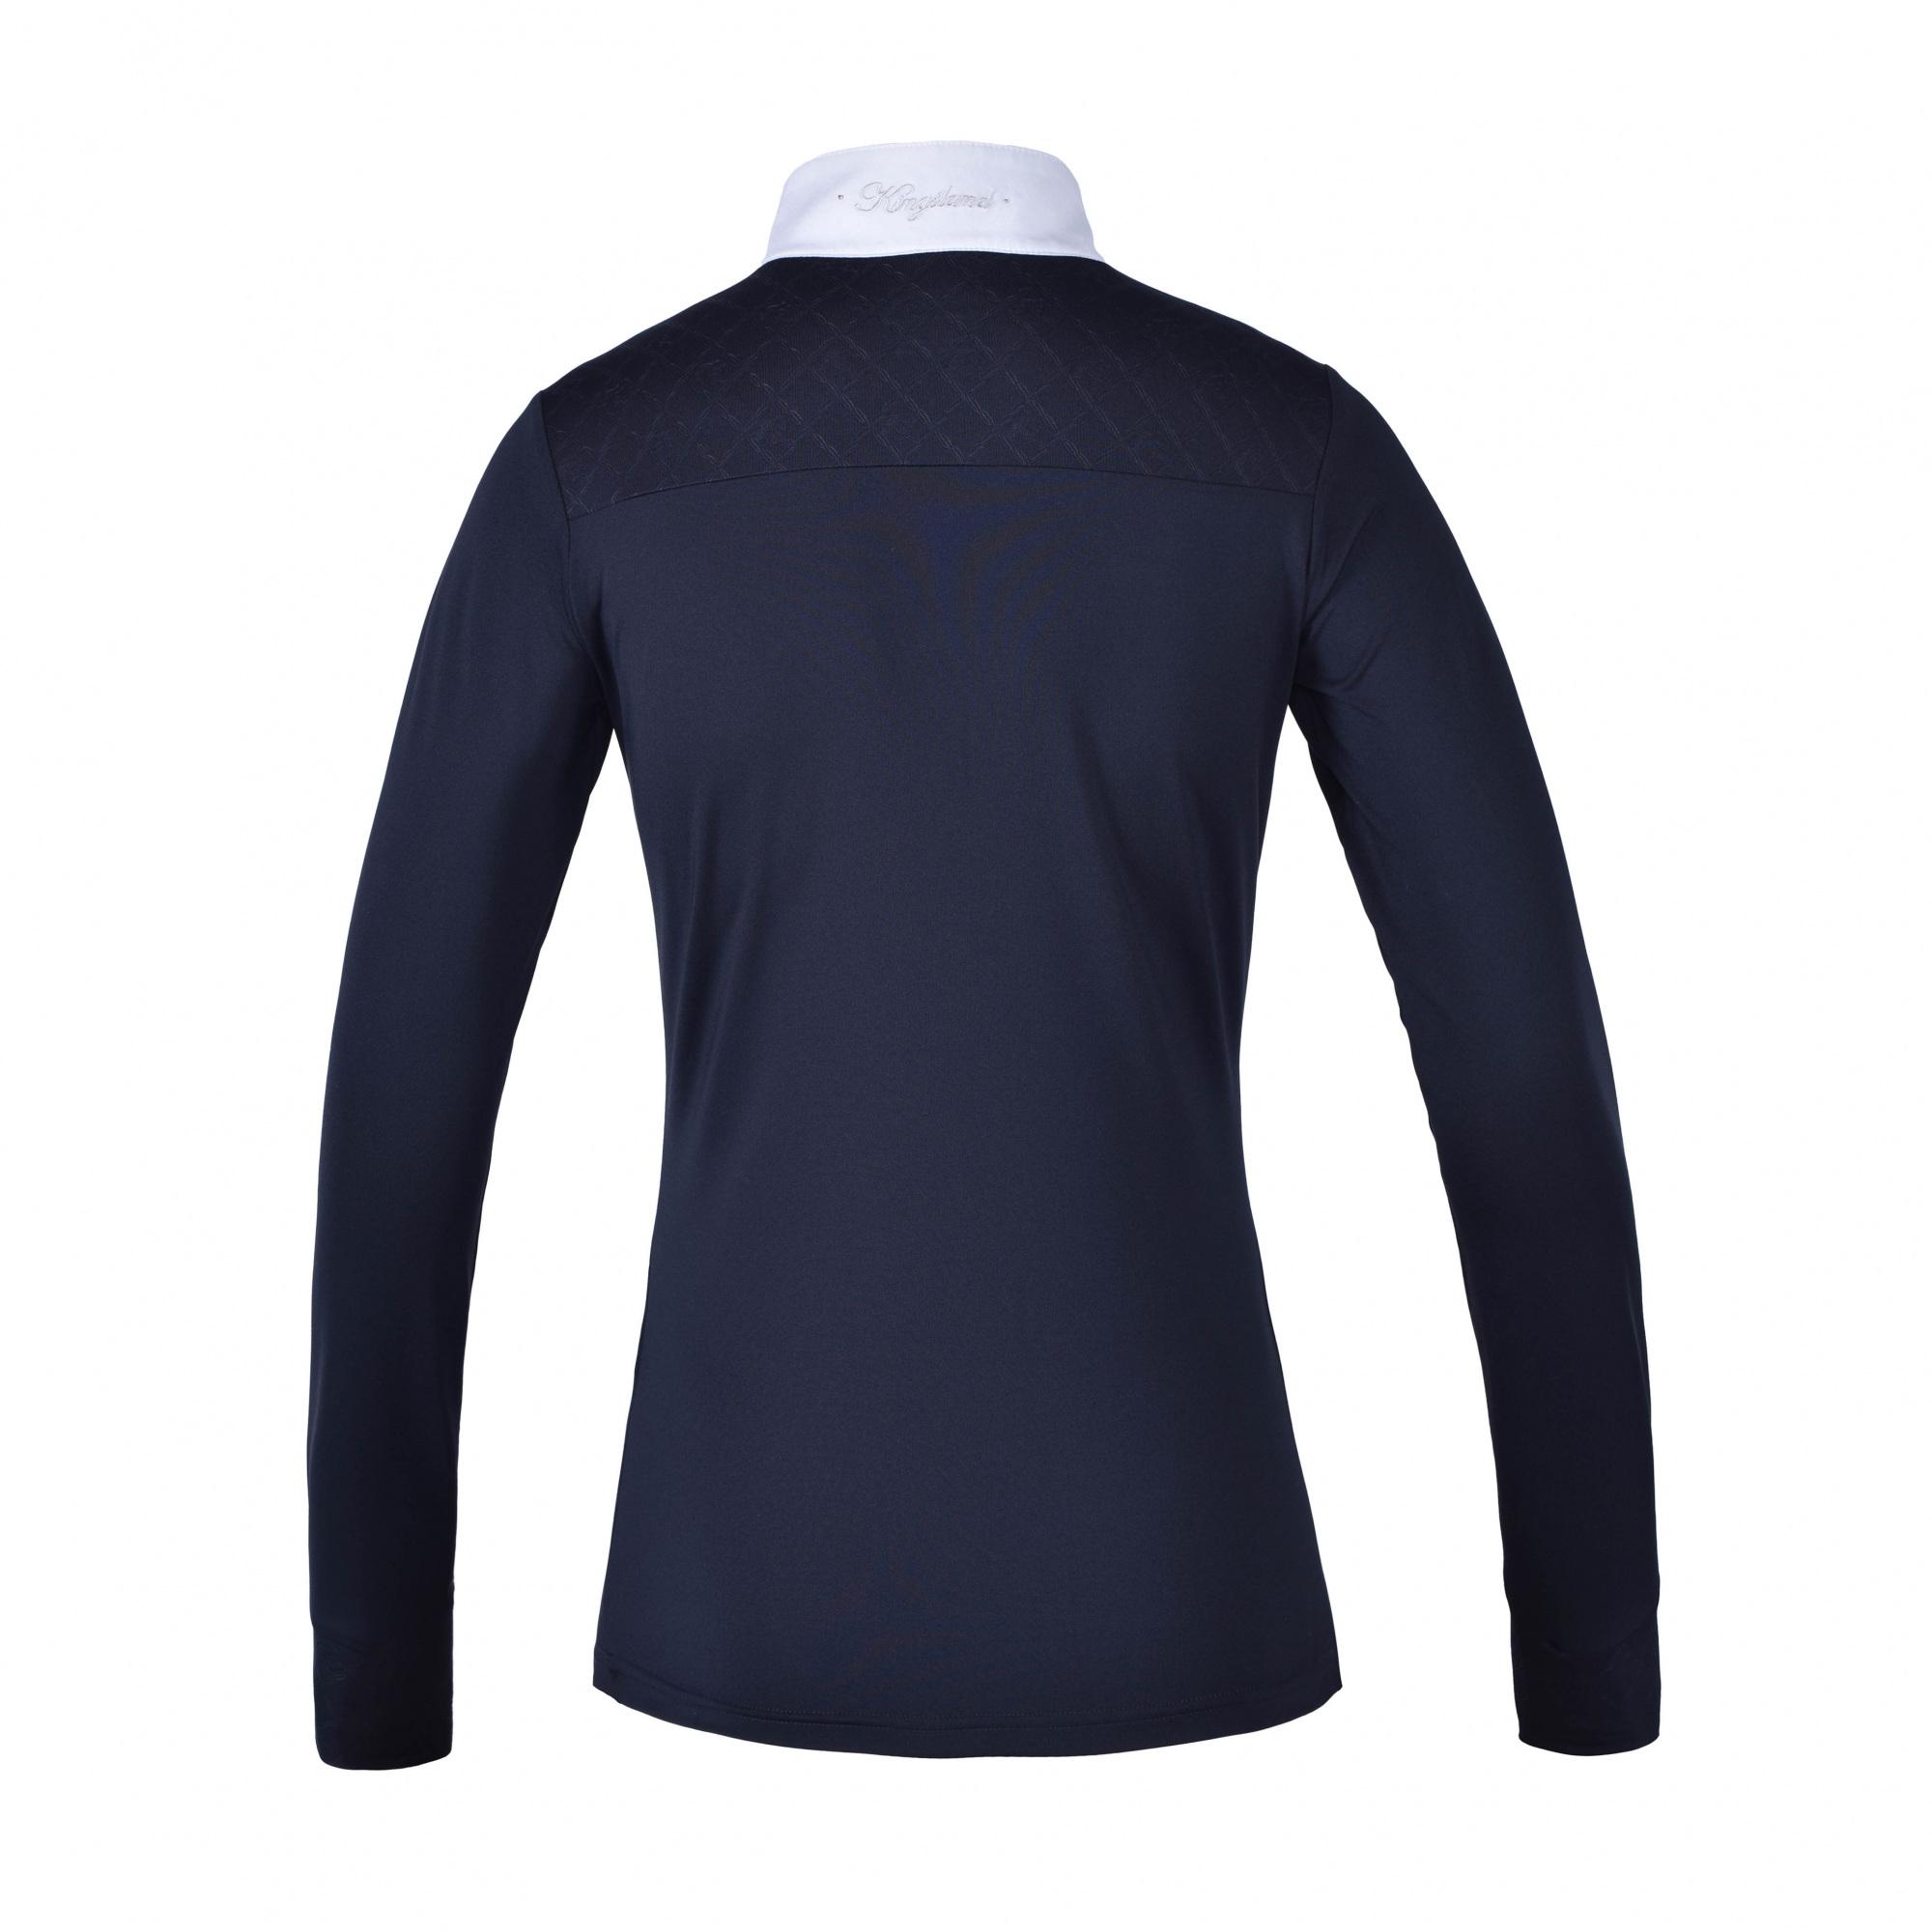 "Kingsland Damen T-Shirt /"" Athena /"" mit Logo auf dem Rücken"